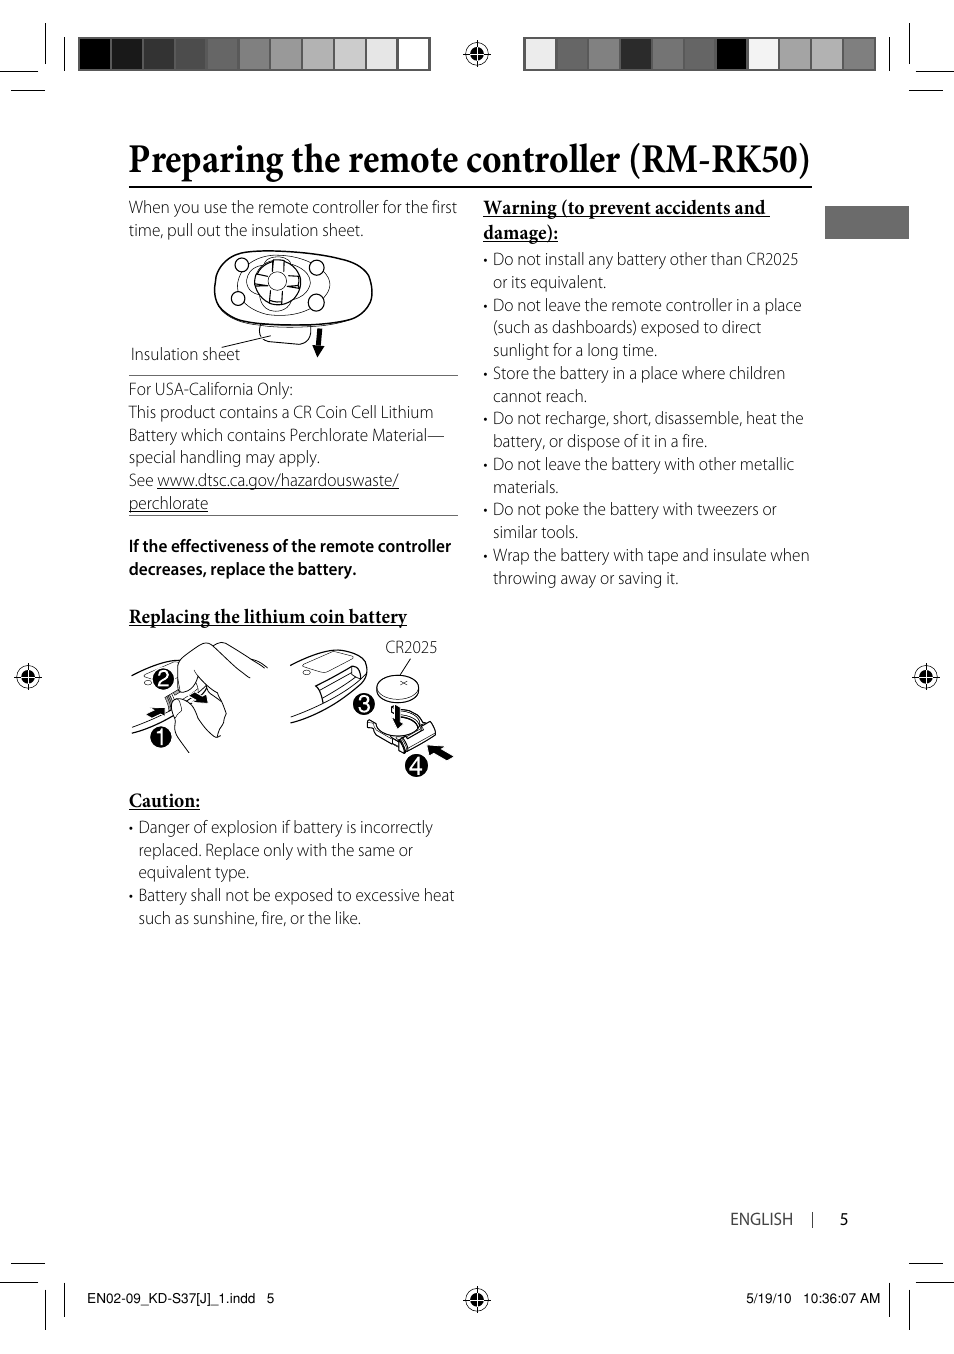 Preparing the remote controller (rm-rk50) | JVC KD-S37 User Manual